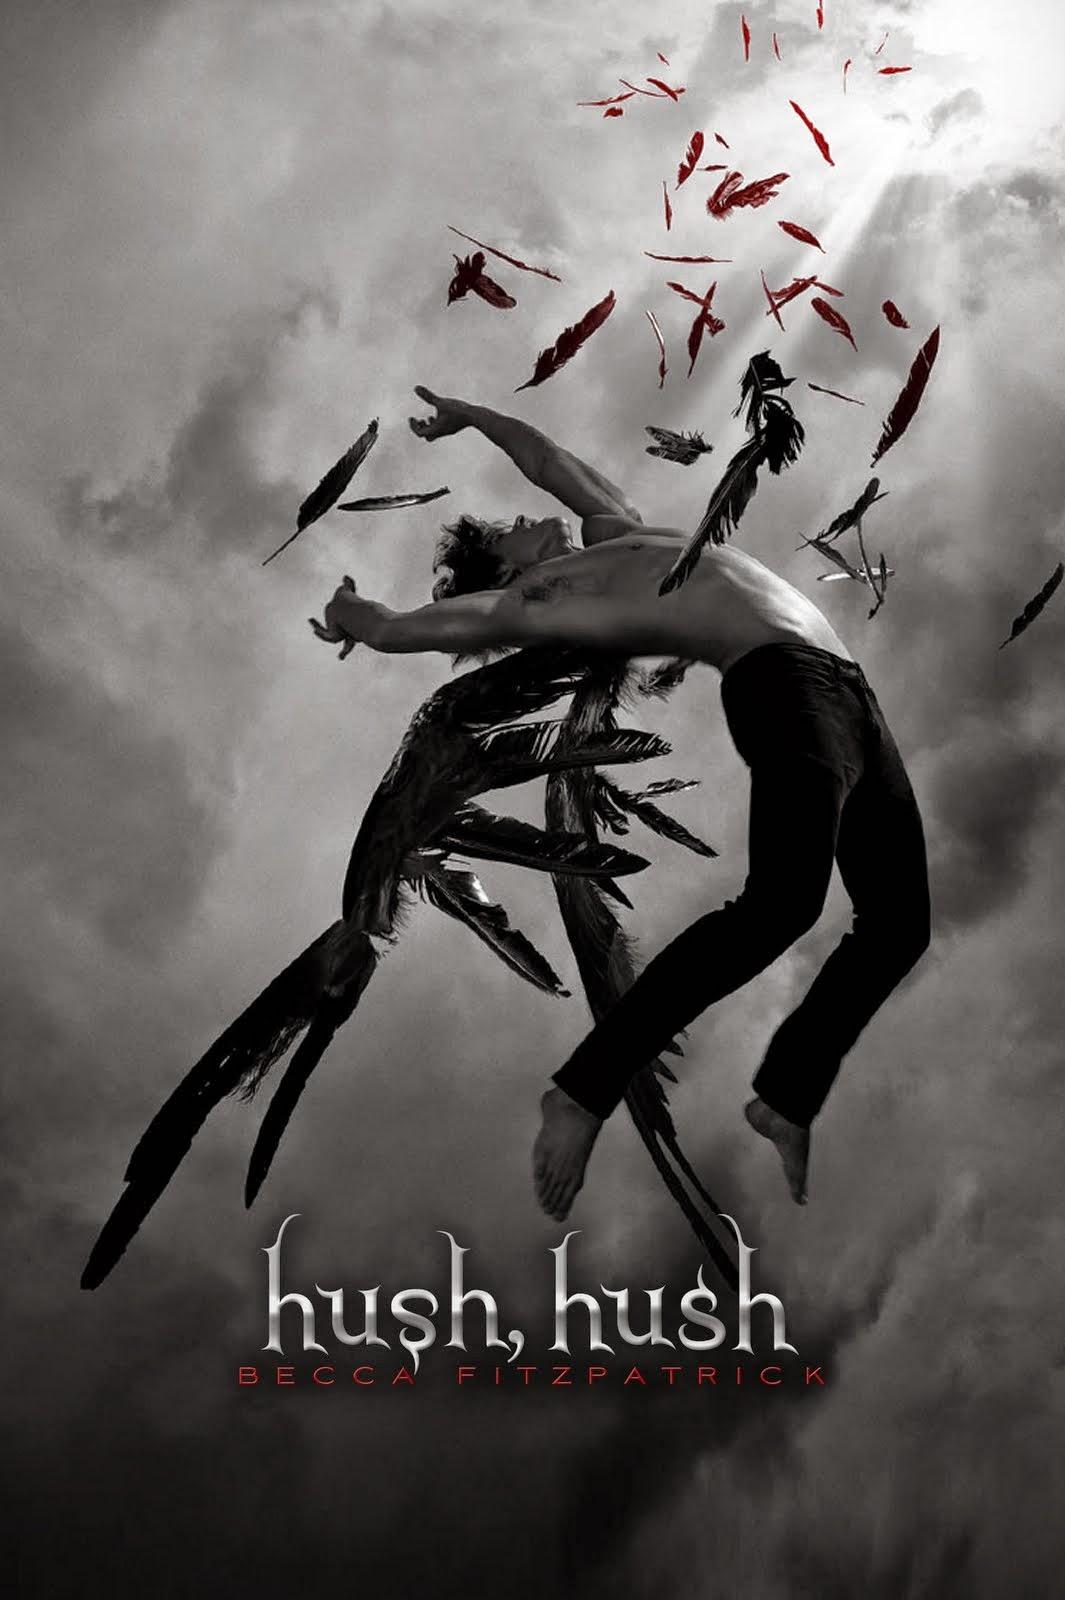 https://www.goodreads.com/book/show/6339664-hush-hush